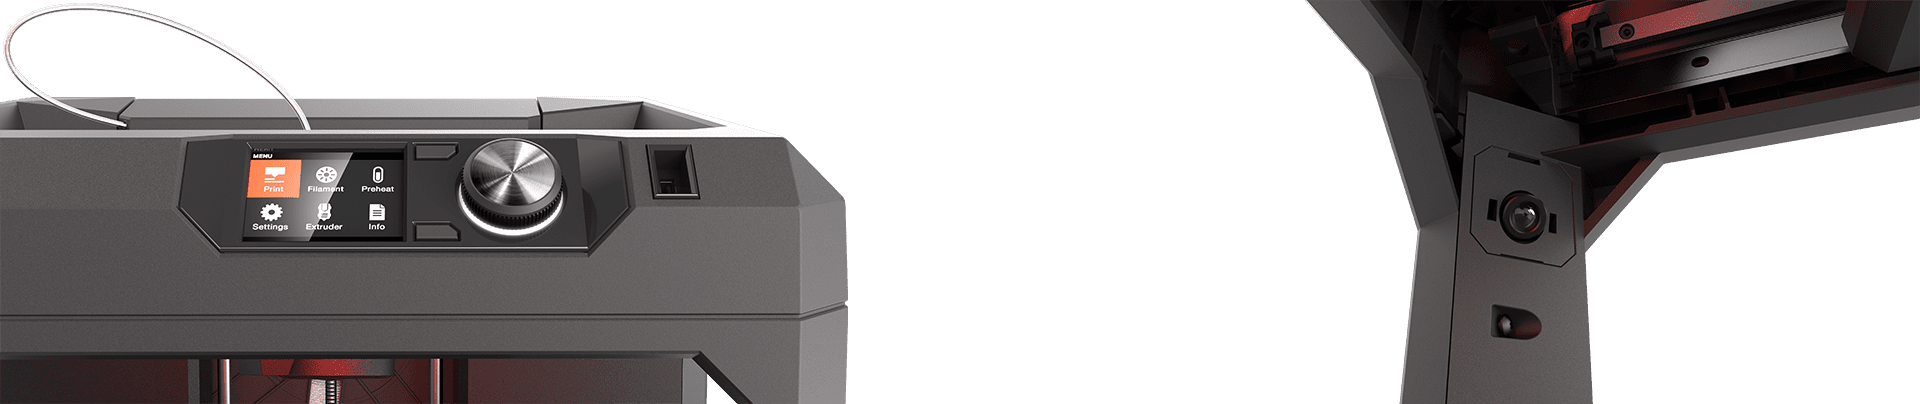 replicatorreszletek